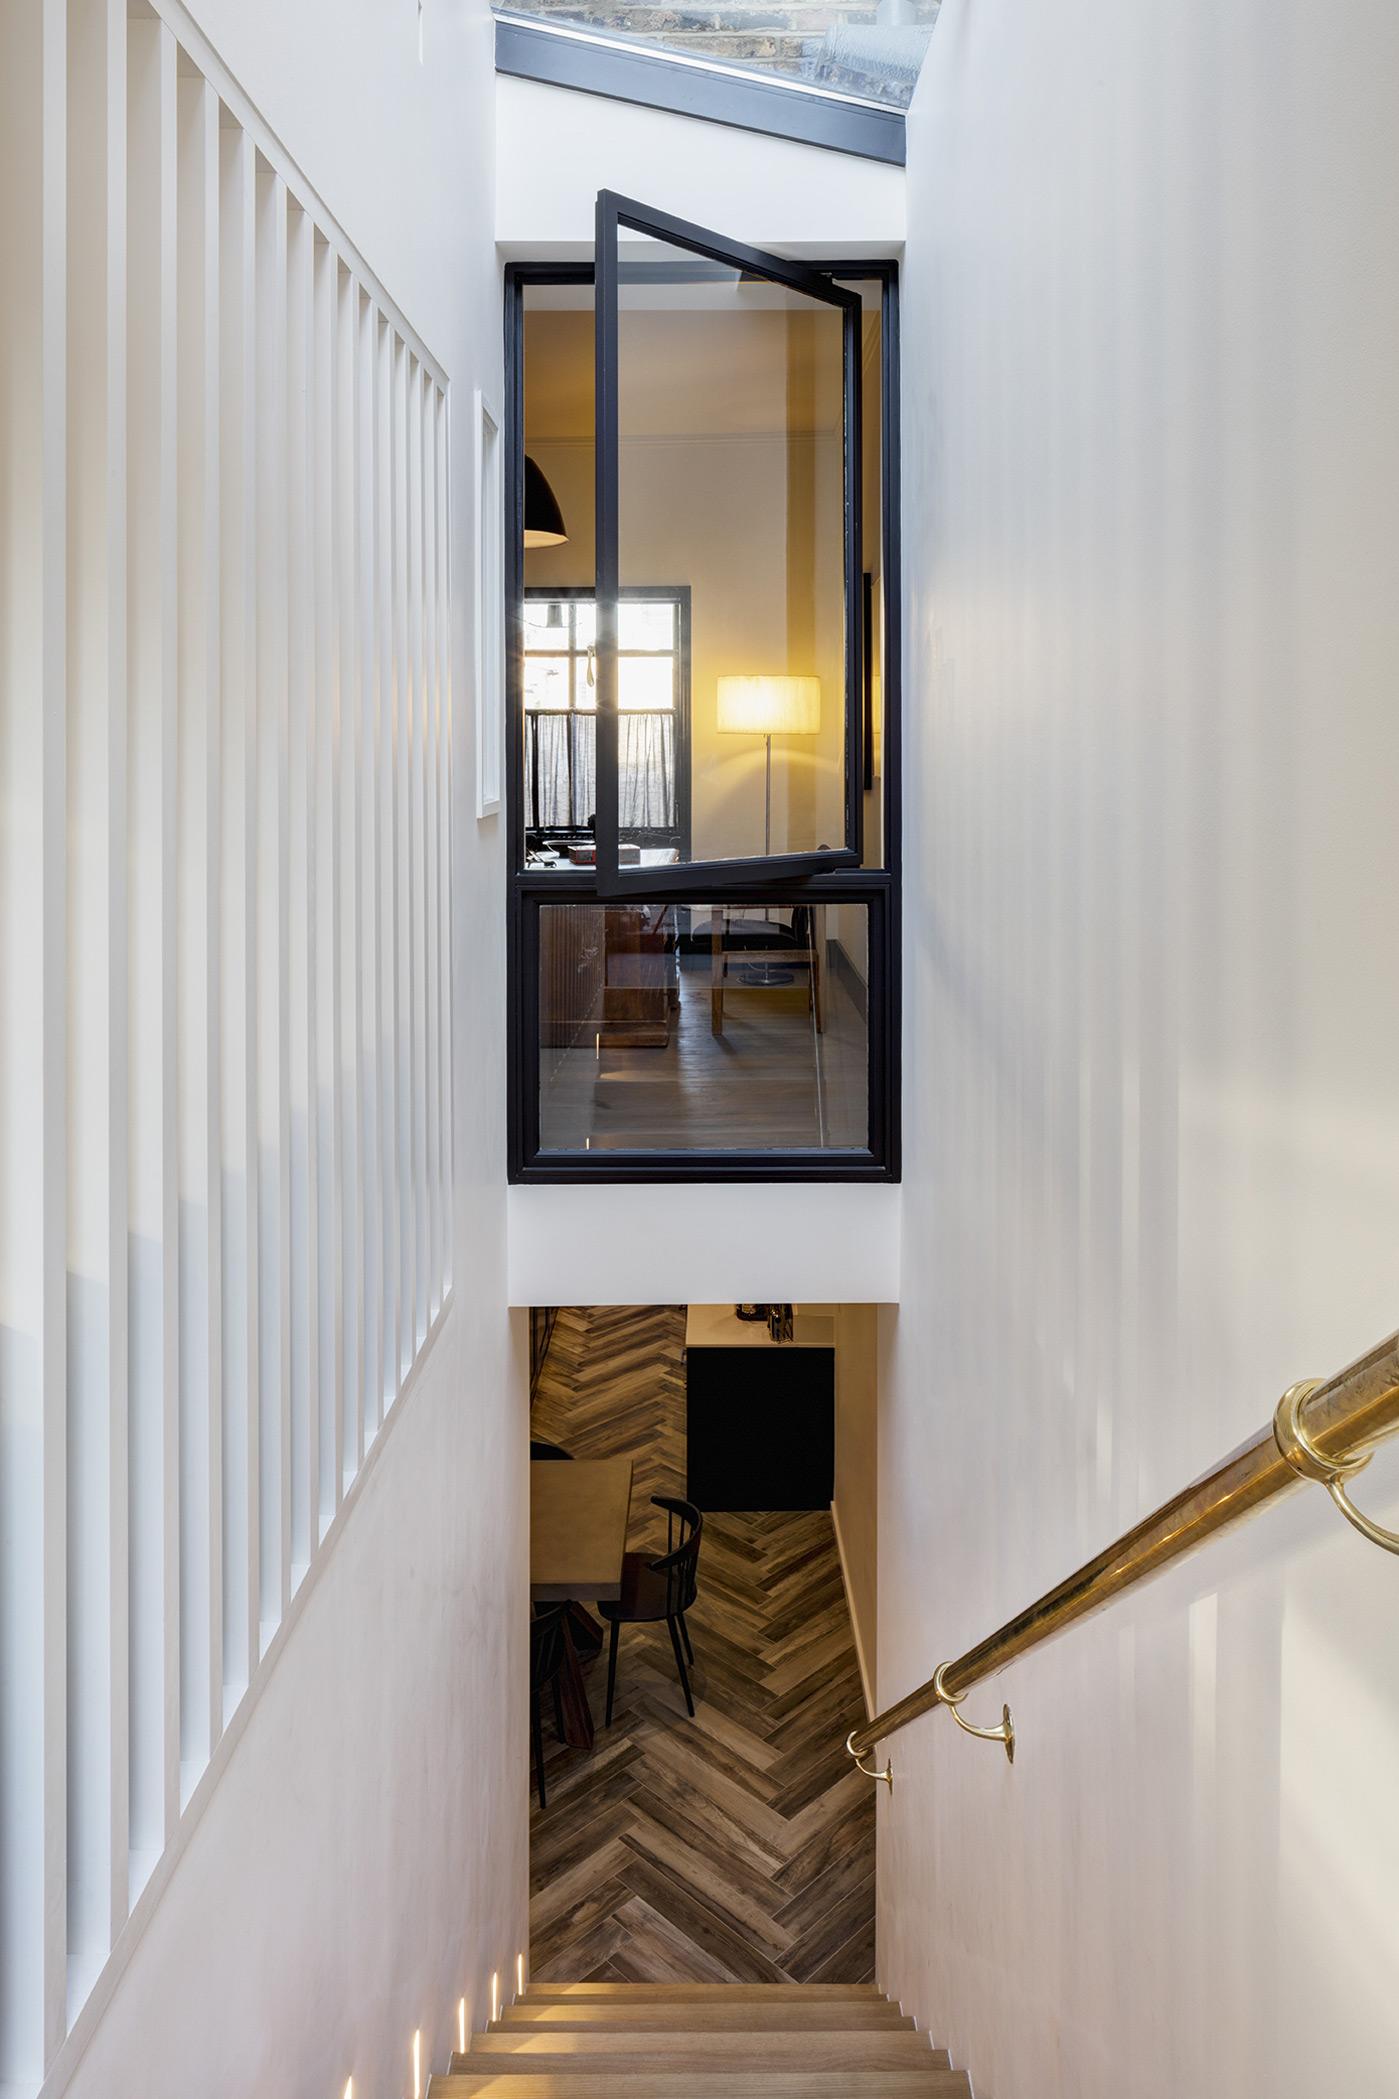 Stair to Basement.jpg